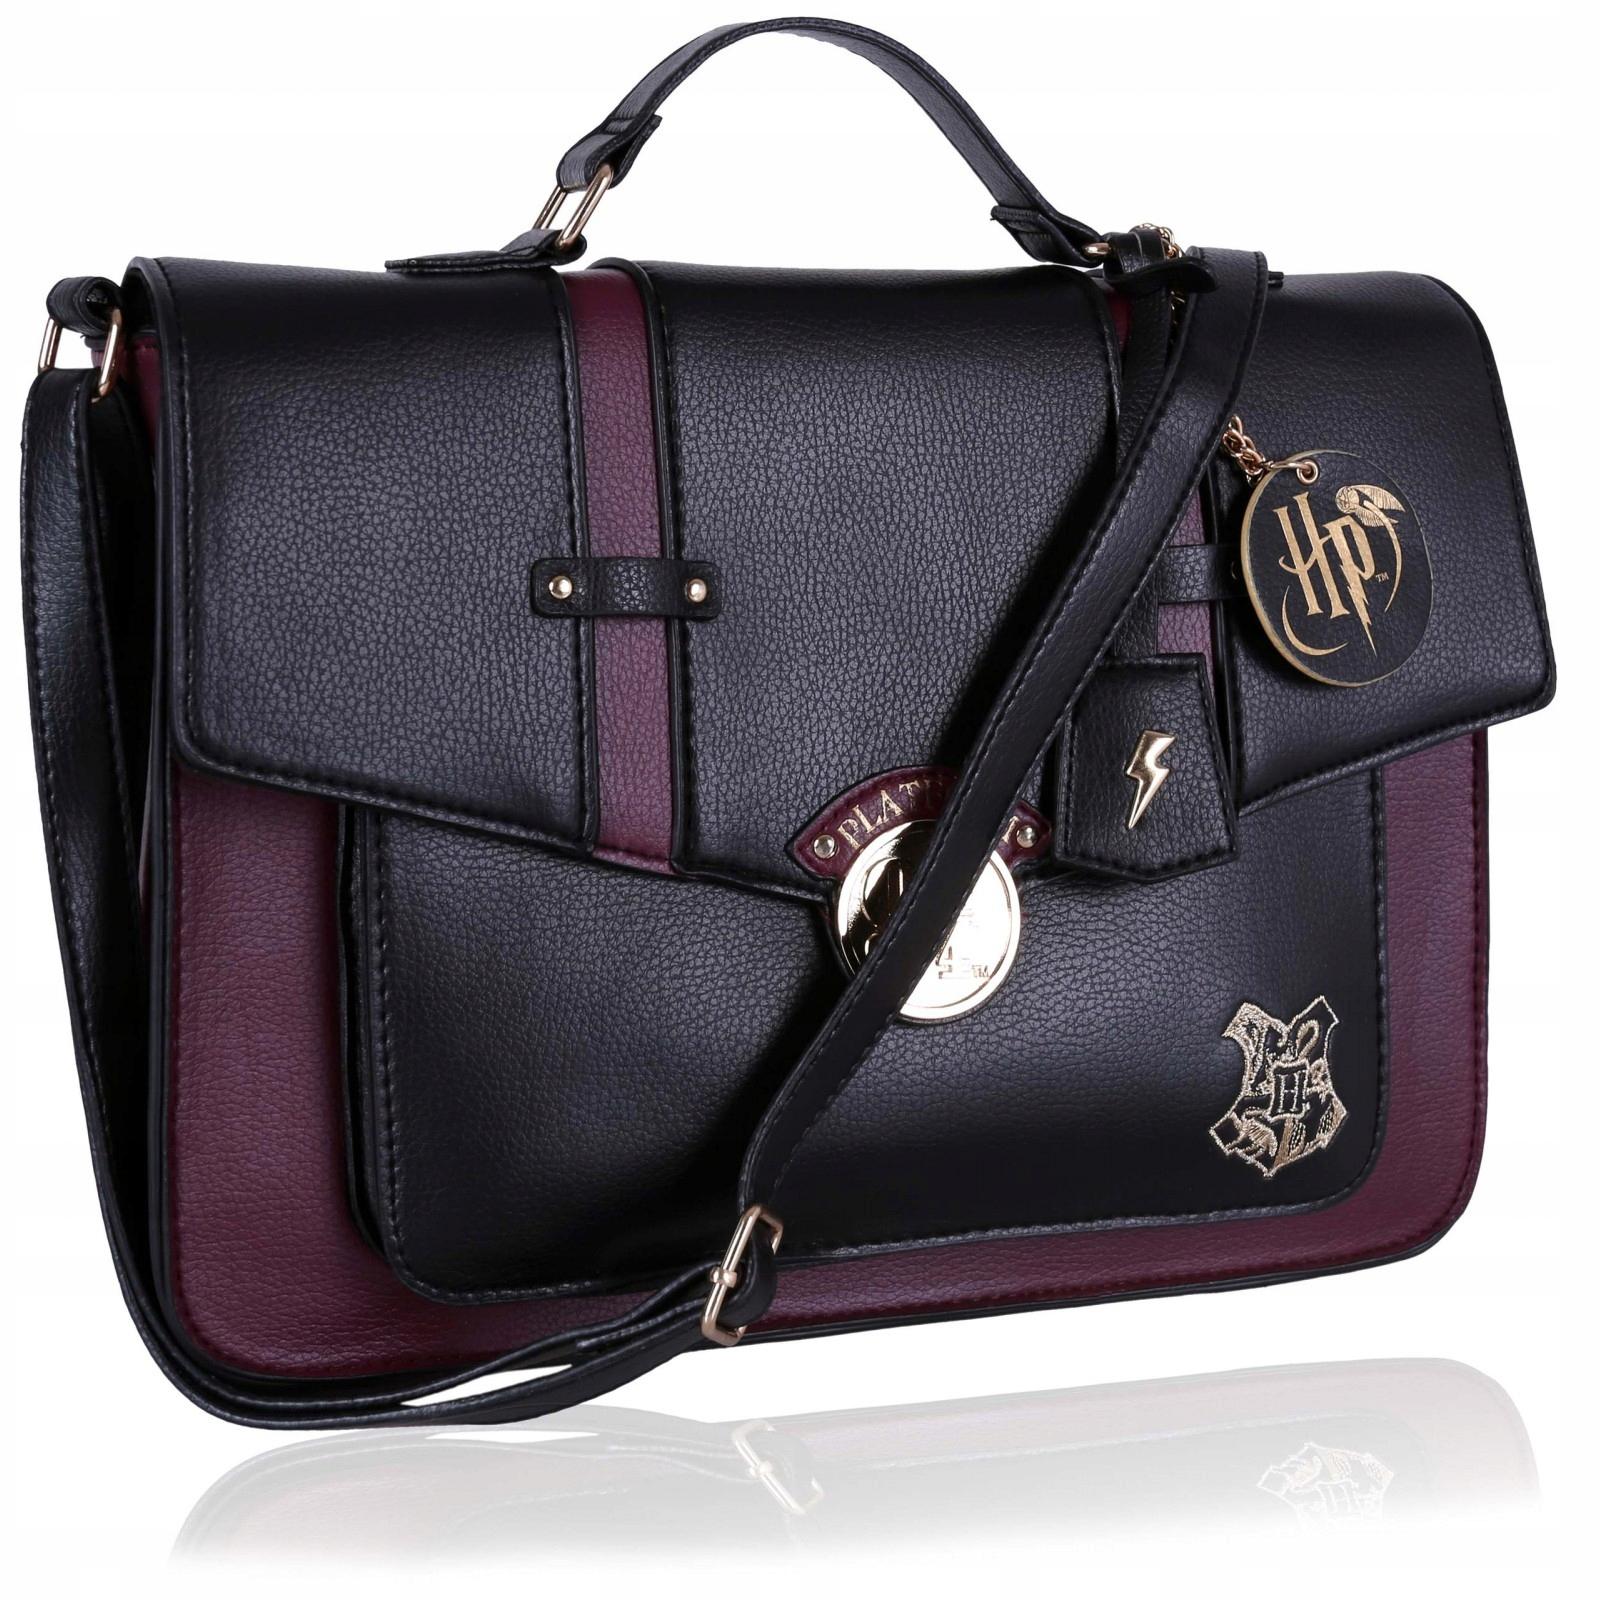 Czarno-bordowa torba na ramię Harry Potter